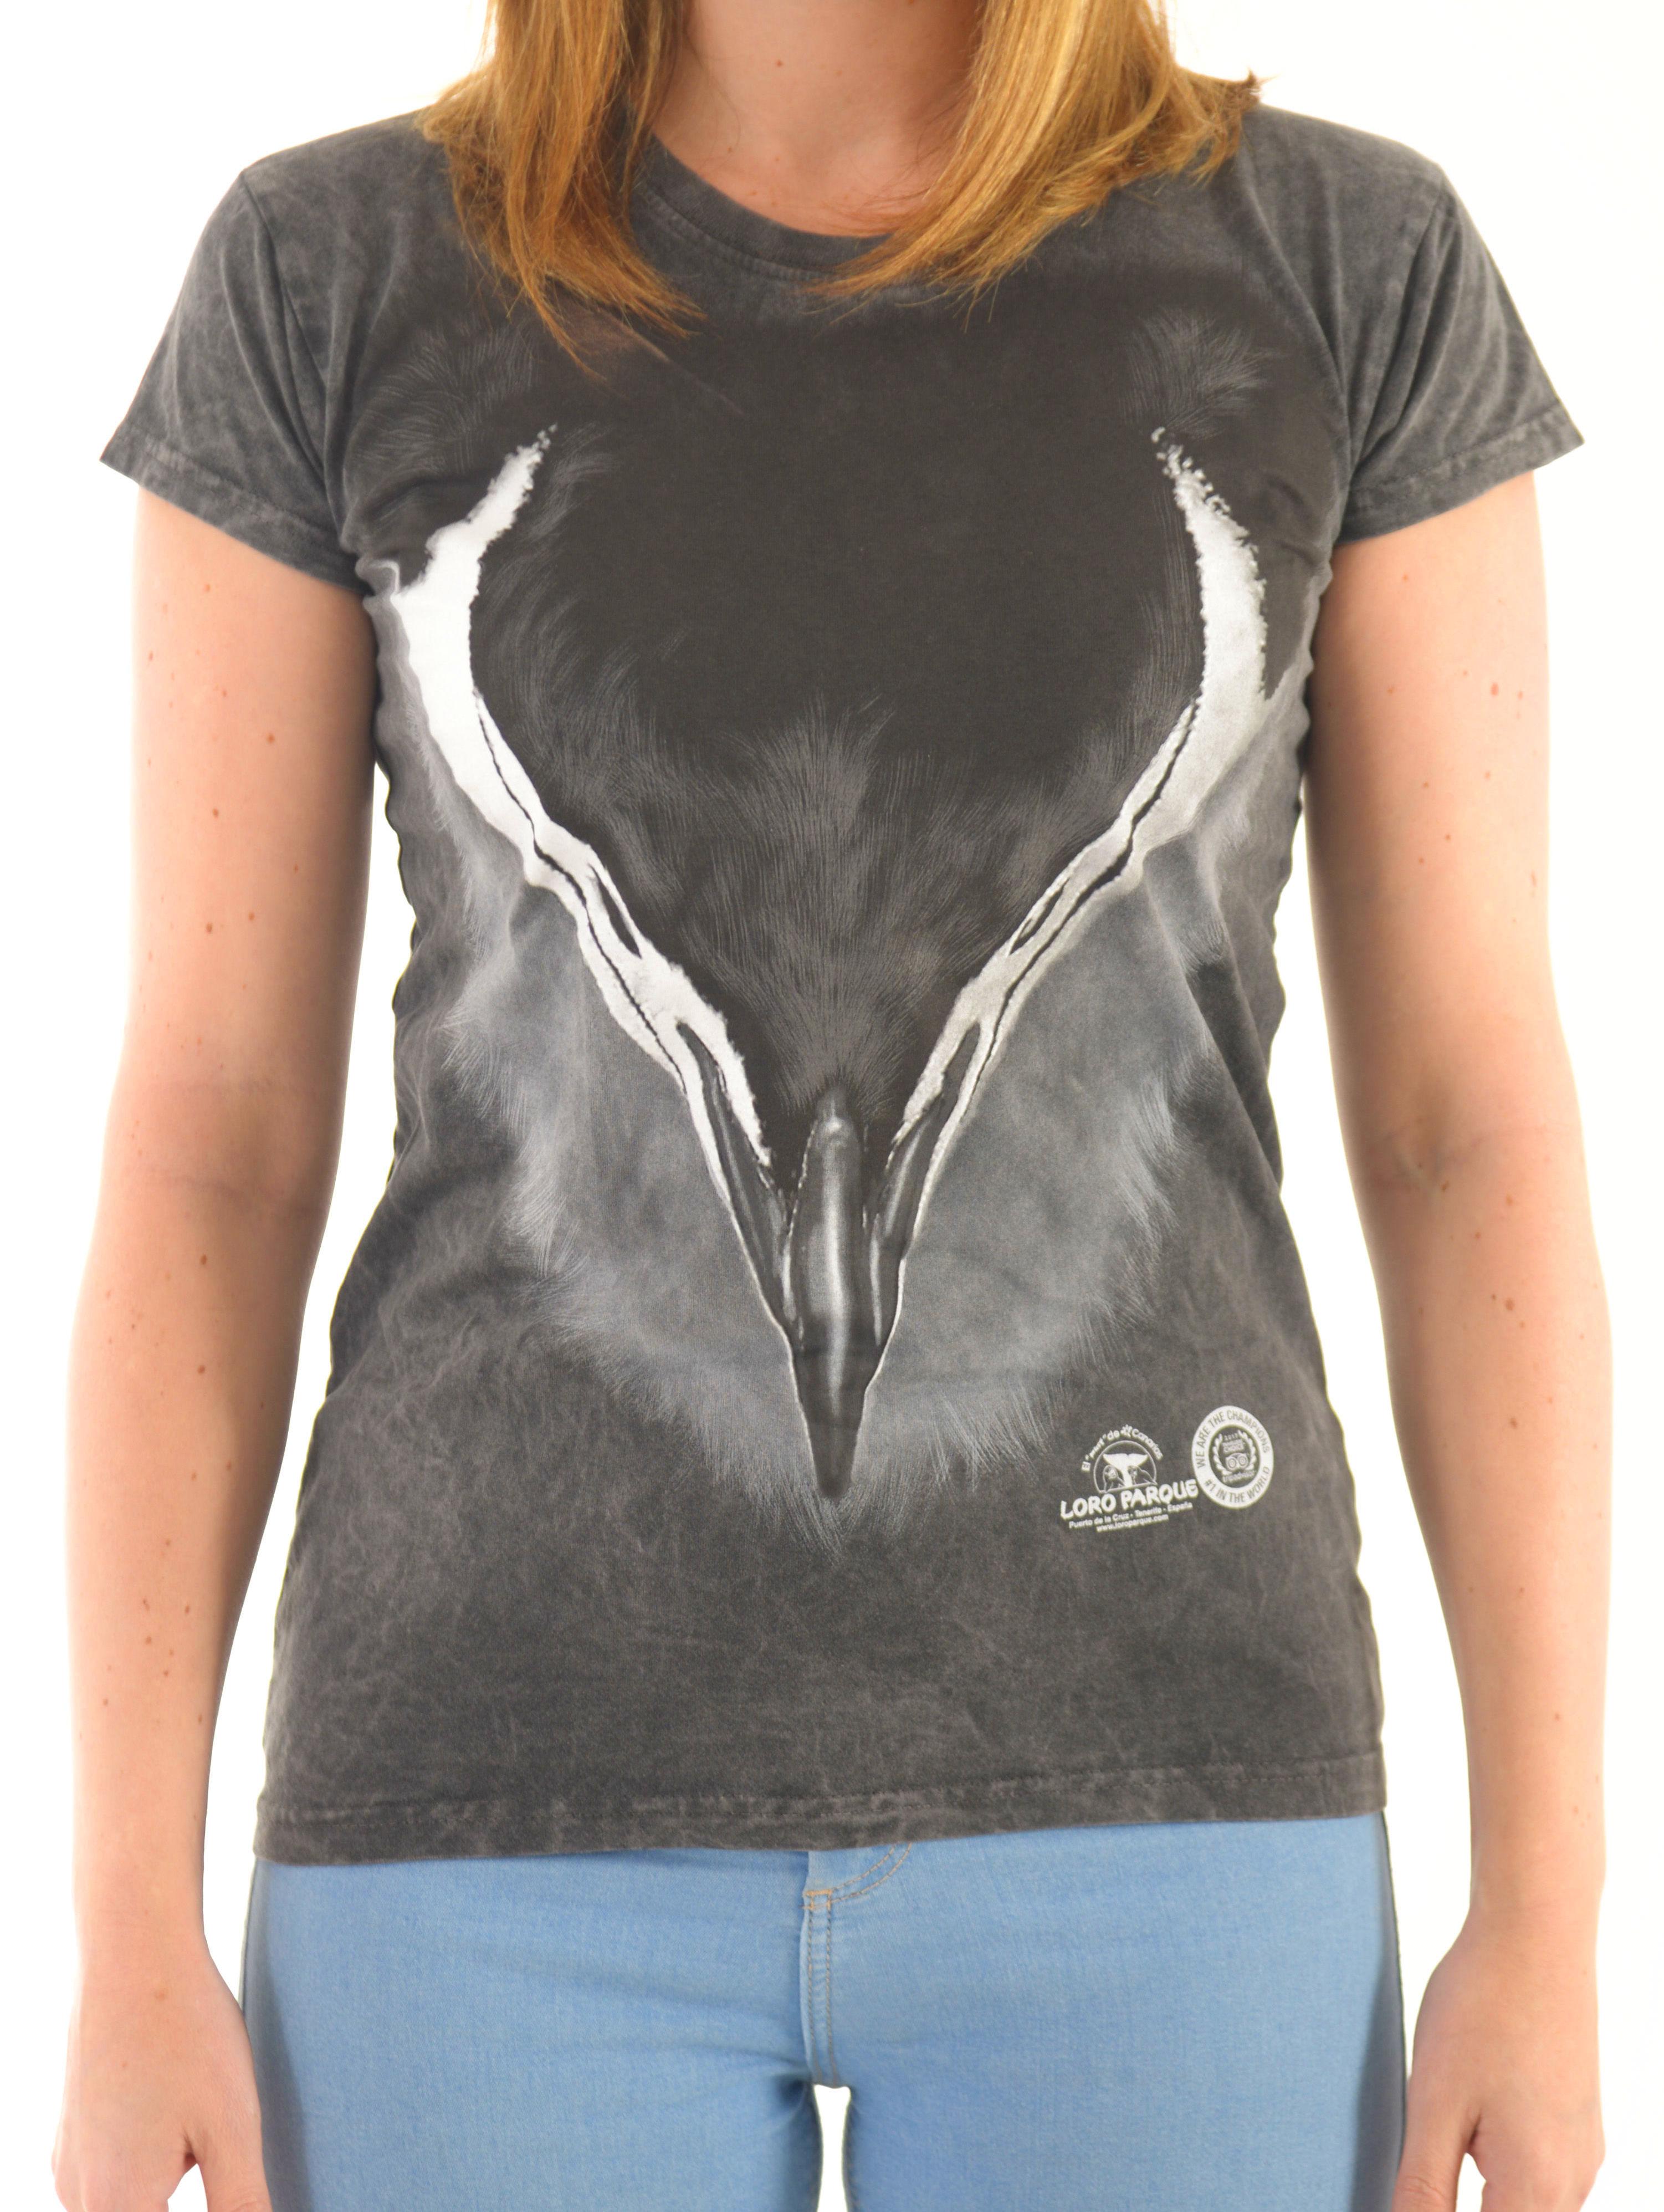 Camiseta  Mujer Barbijo / Penguin Women´s T-shirt: Productos de BELLA TRADICION